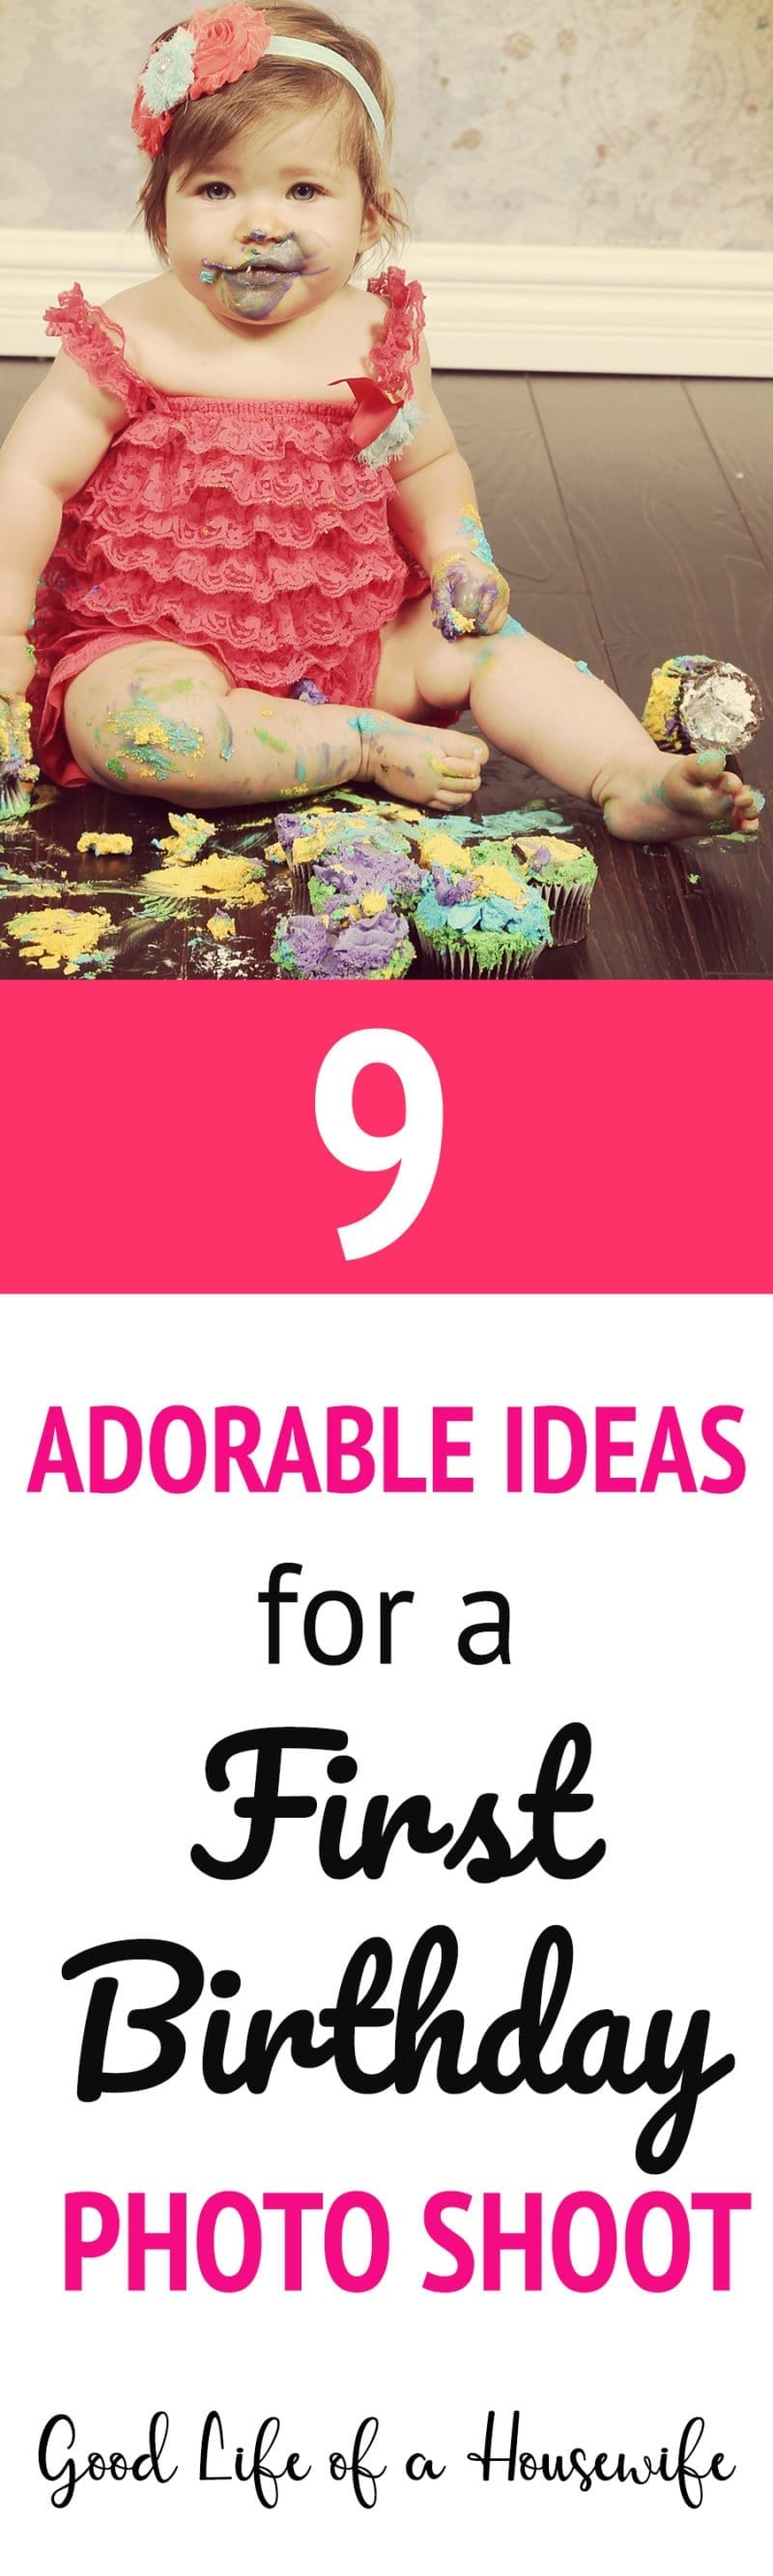 9 adorable ideas for a first birthday photo shoot for little girls. #smashcake #firstbirthday #firstbirthdayideas